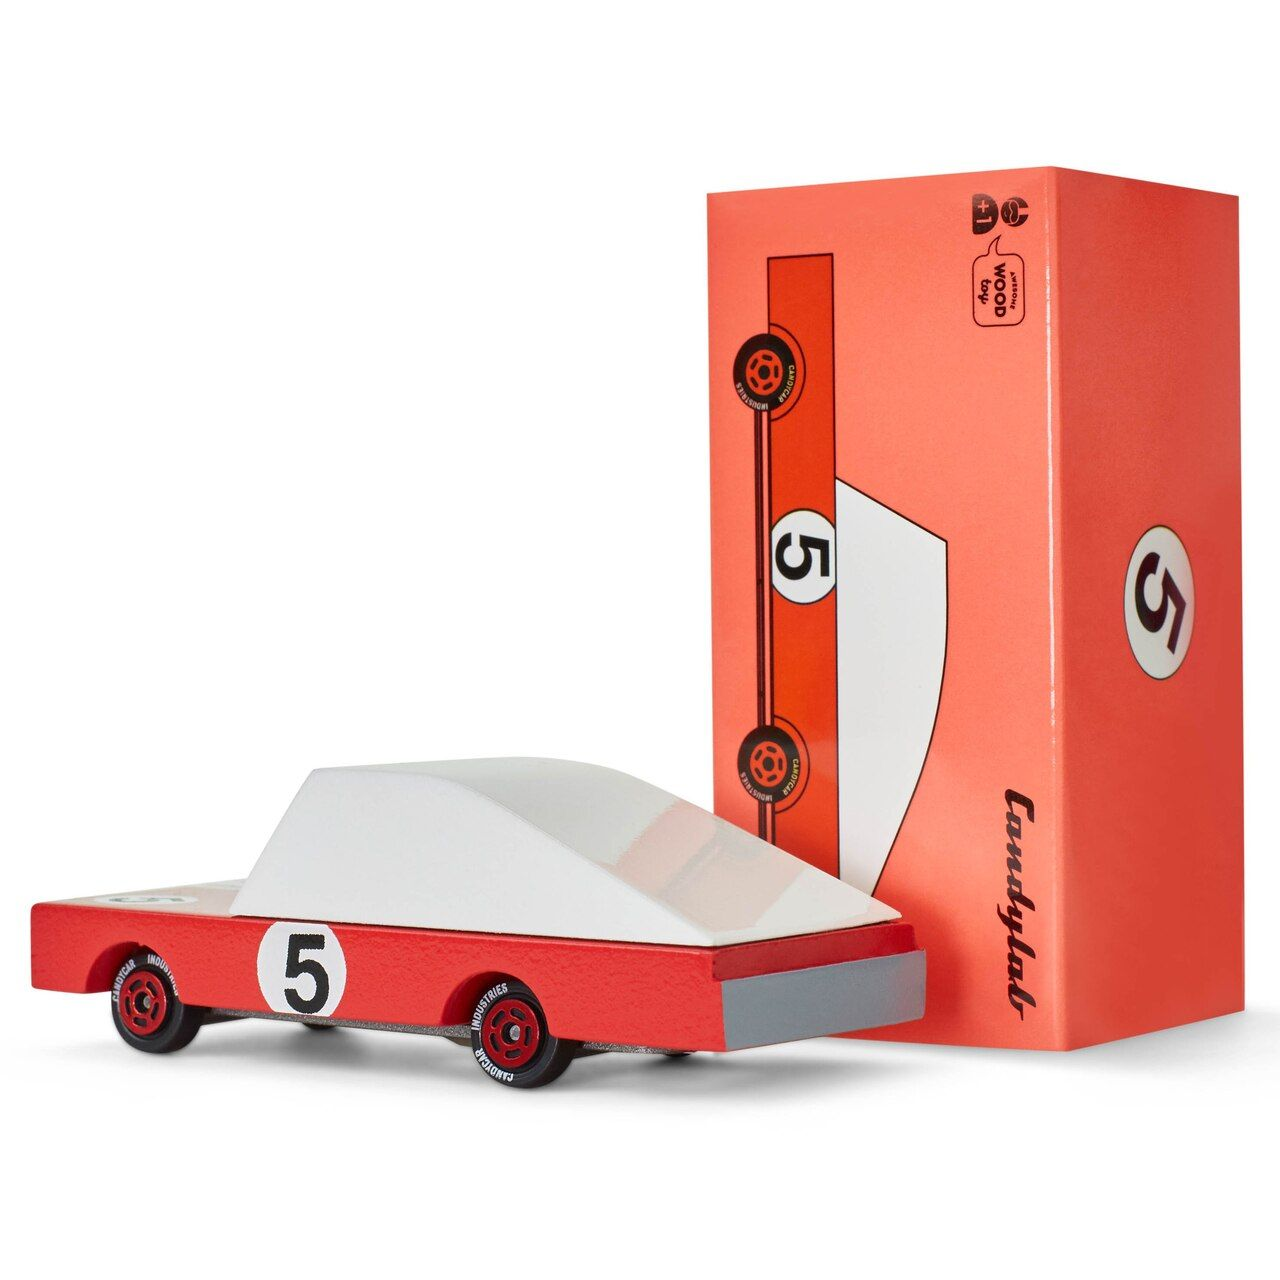 Candycar Red Racer 5 Vinyl Toys Racer Wooden Toy Car